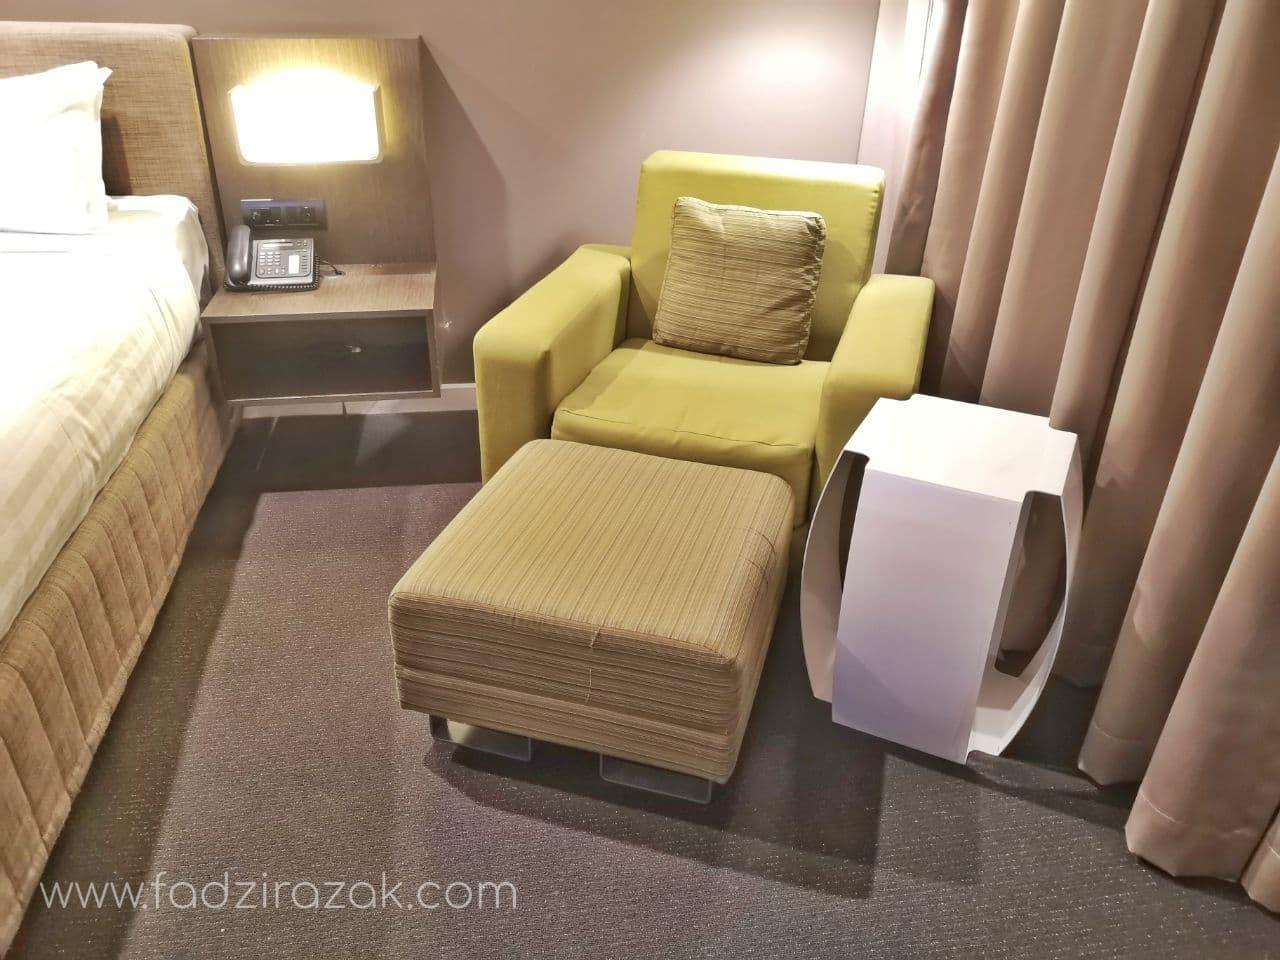 Mandatory hotel quarantine Covid19 2020